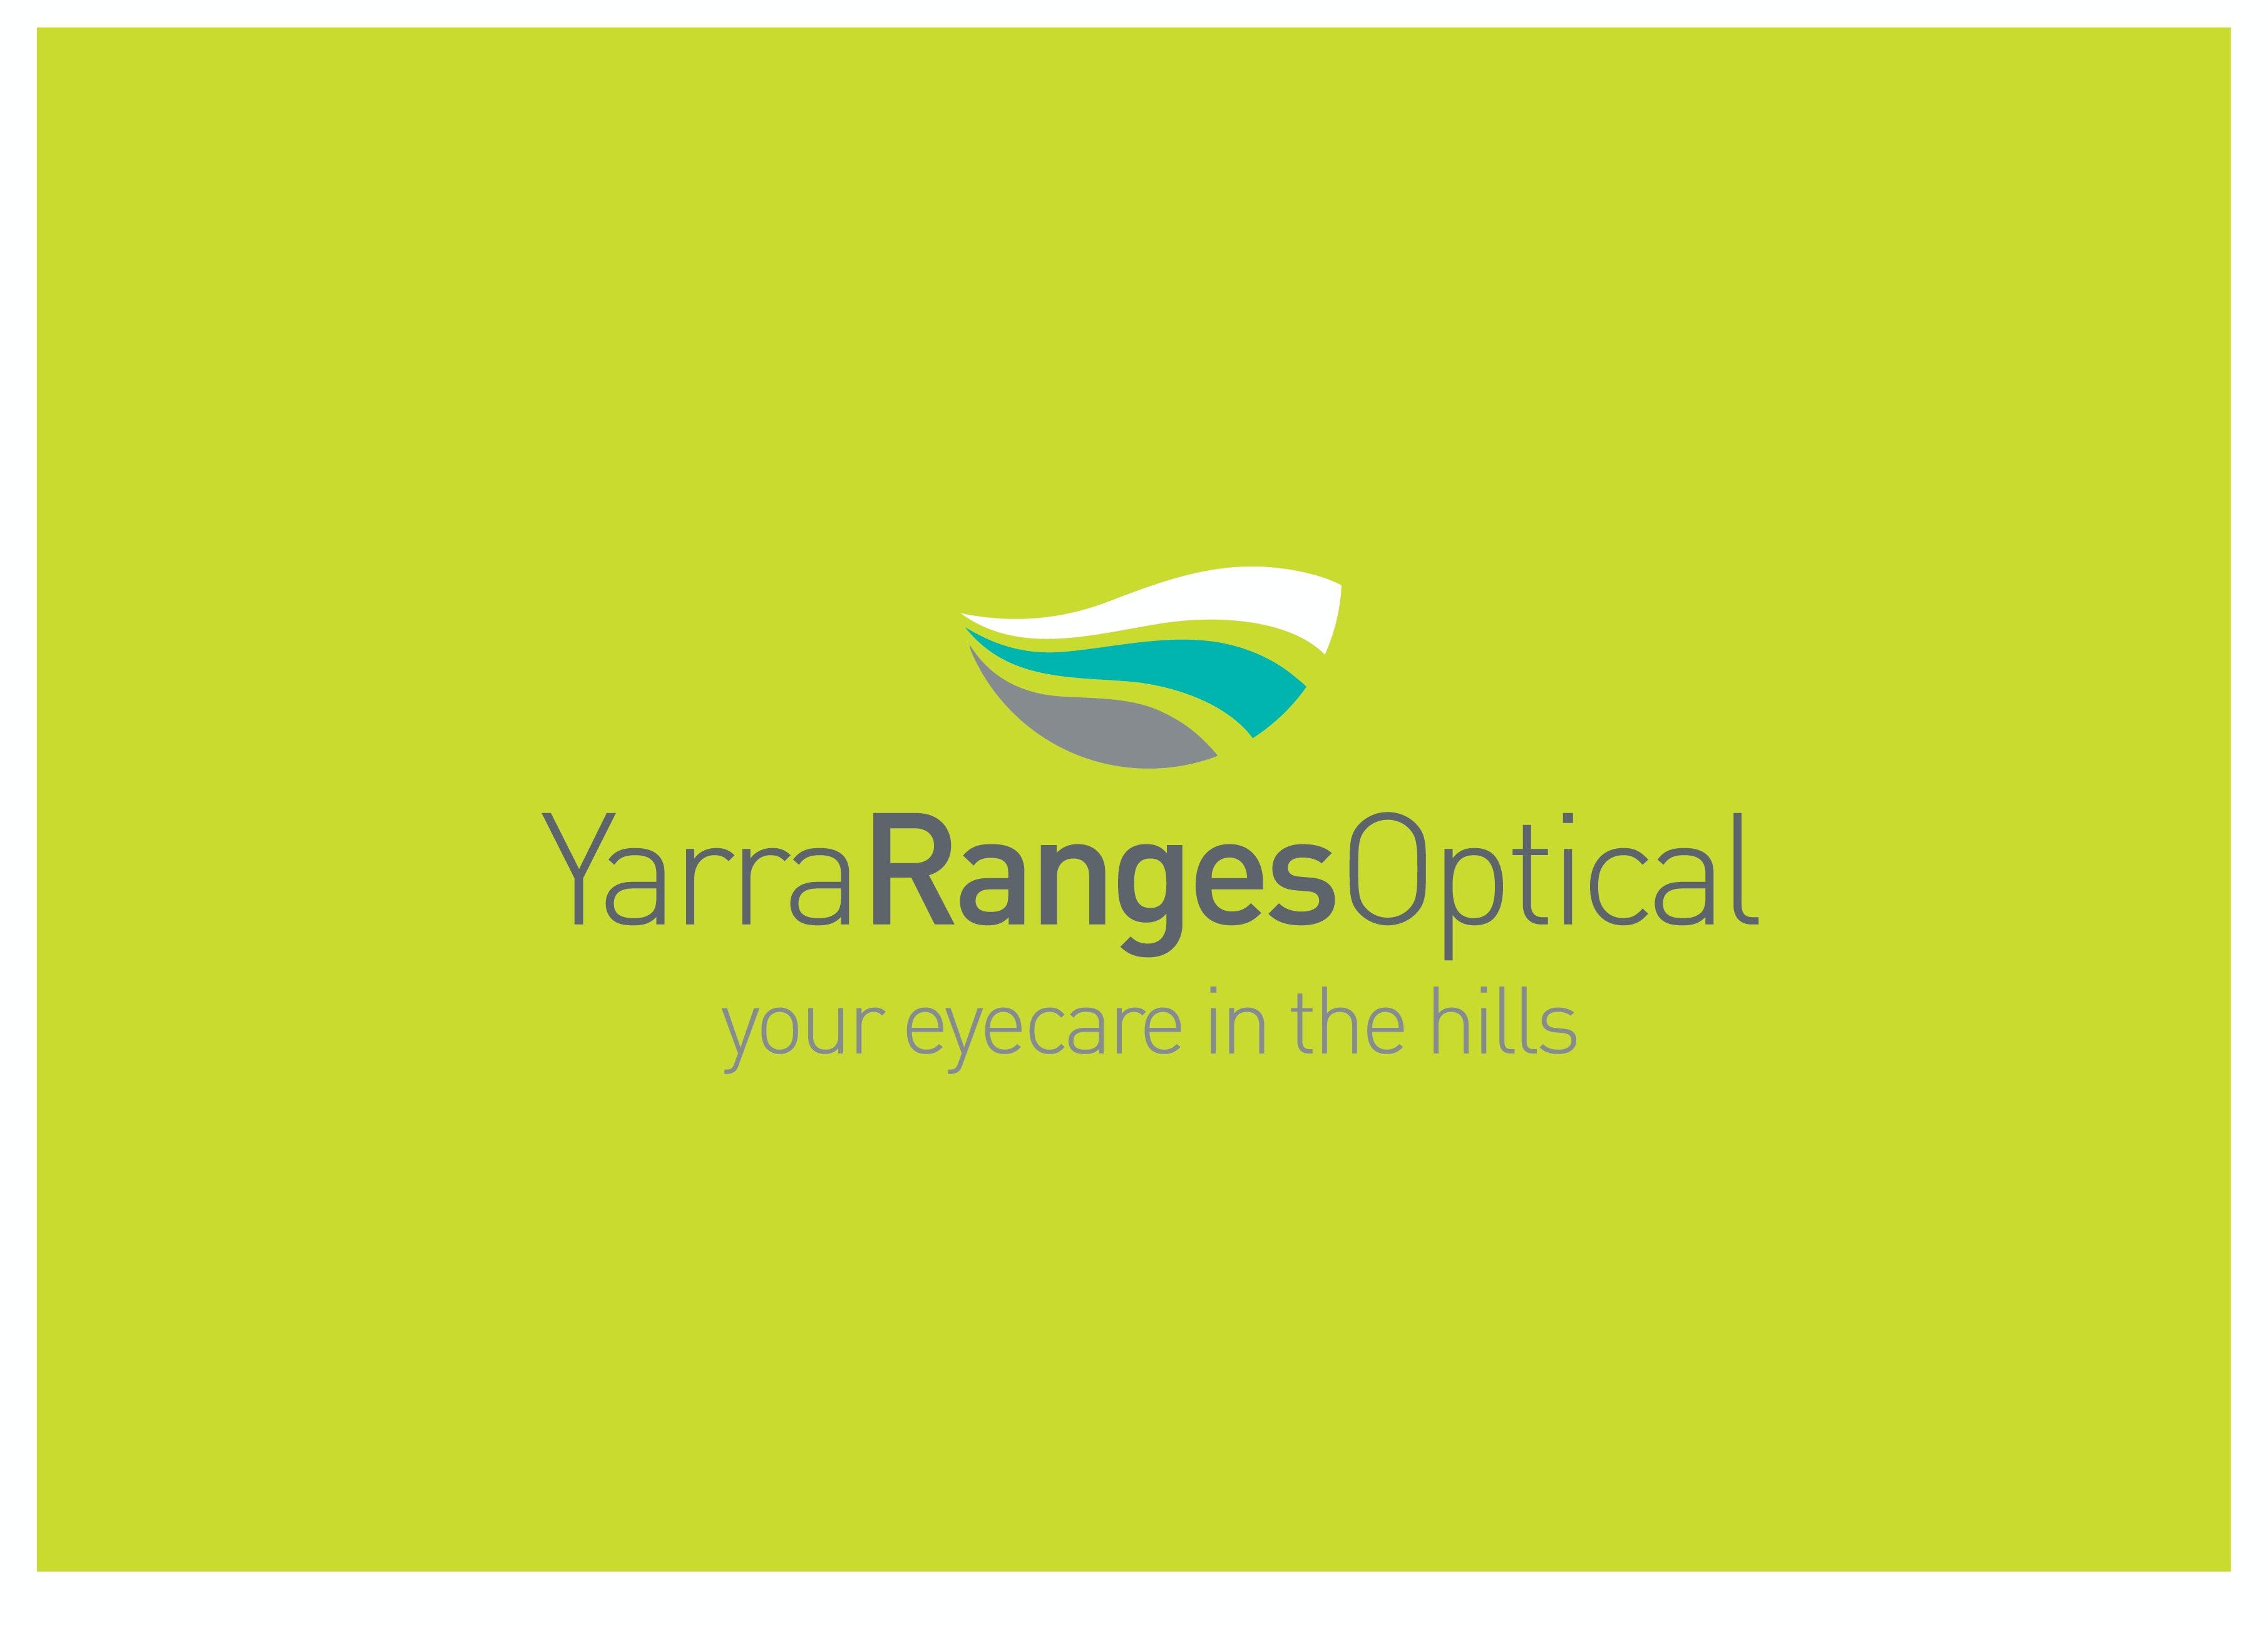 logo for Yarra Ranges Optical Optometrists